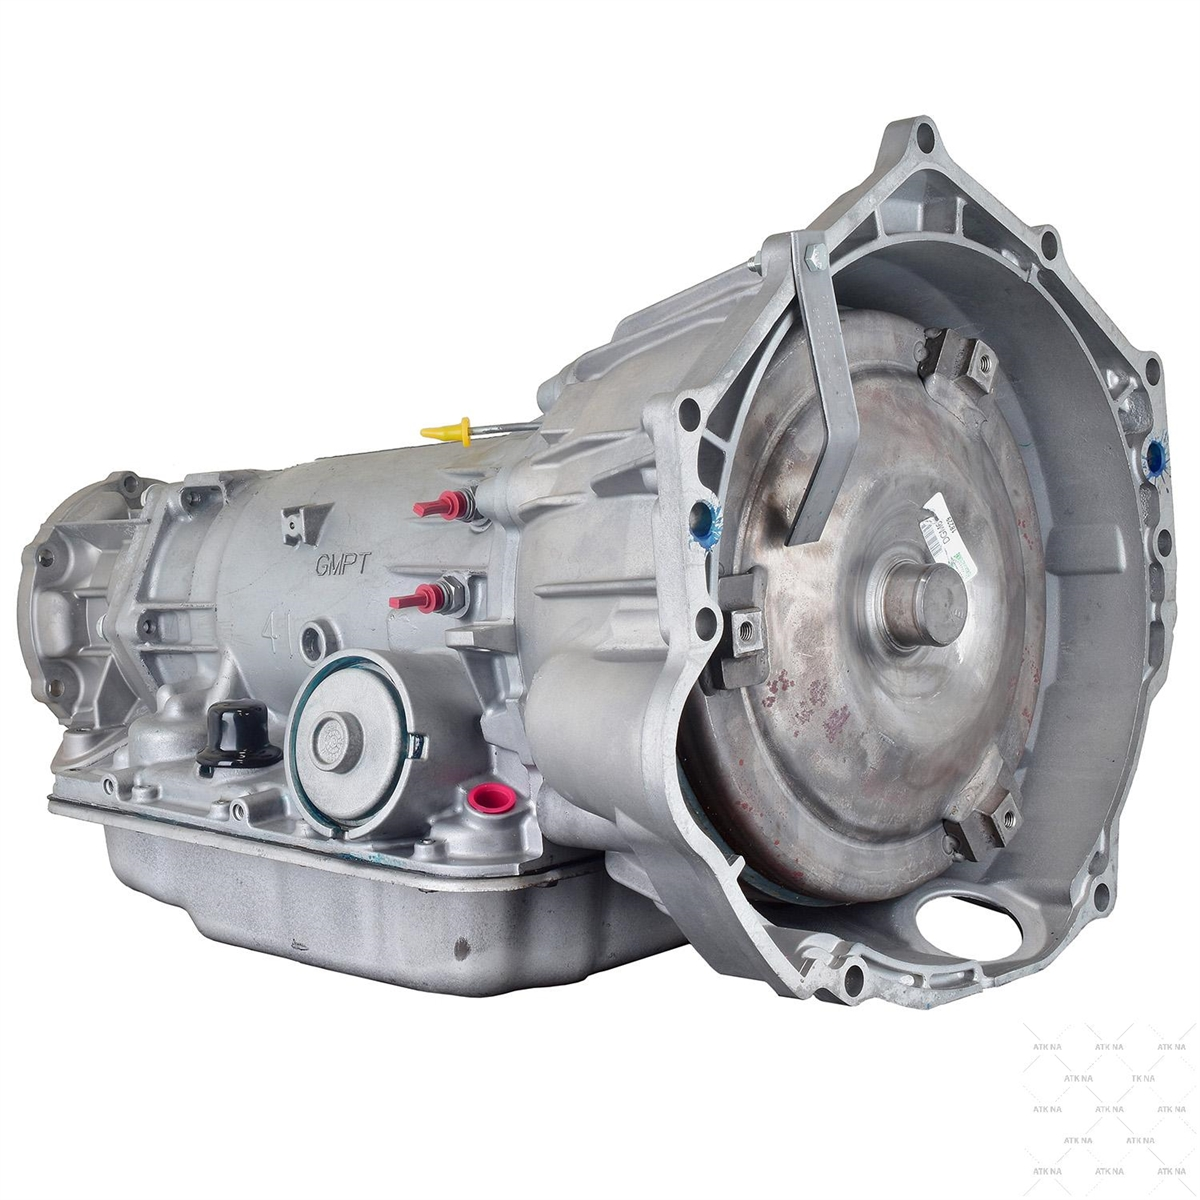 ATK 7205-HP Heavy Duty 4L60E 4x4 Transmission